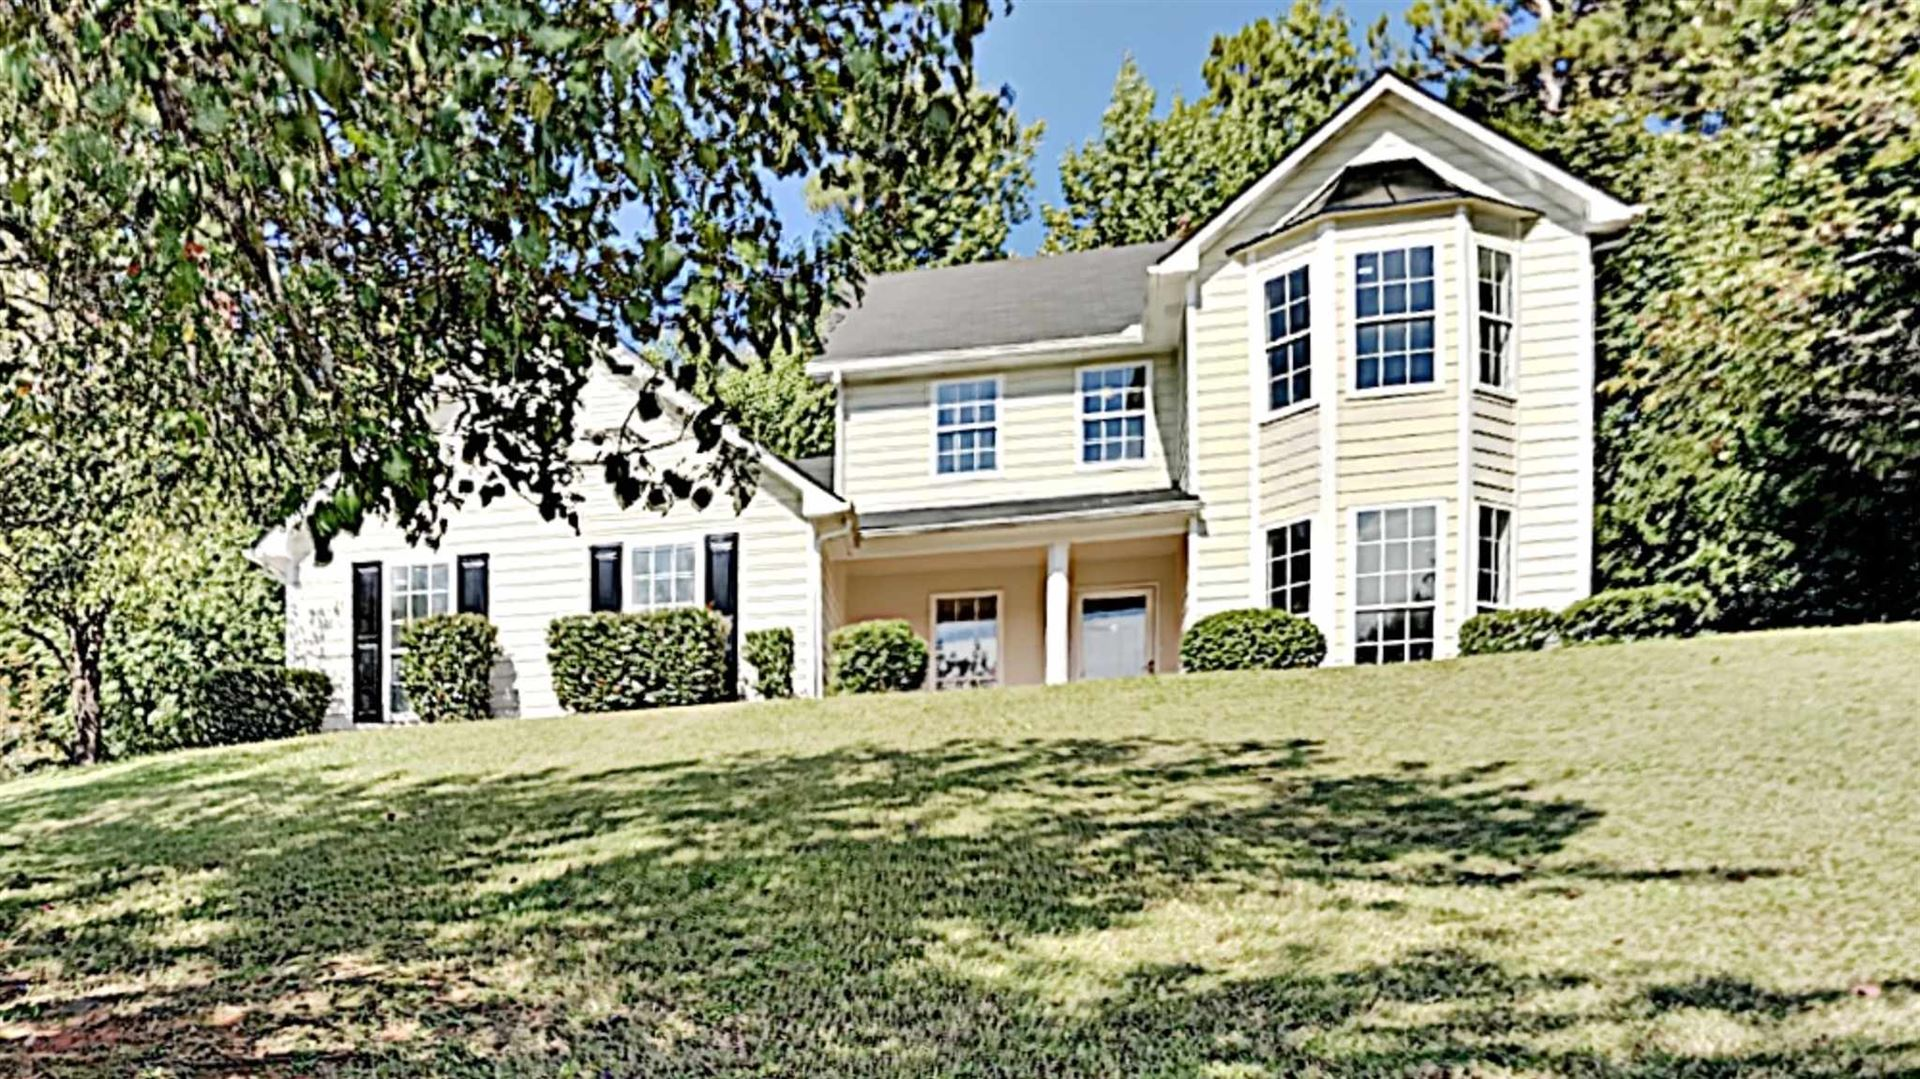 3366 Harvester Woods Rd, Decatur, GA 30034 - #: 8876091